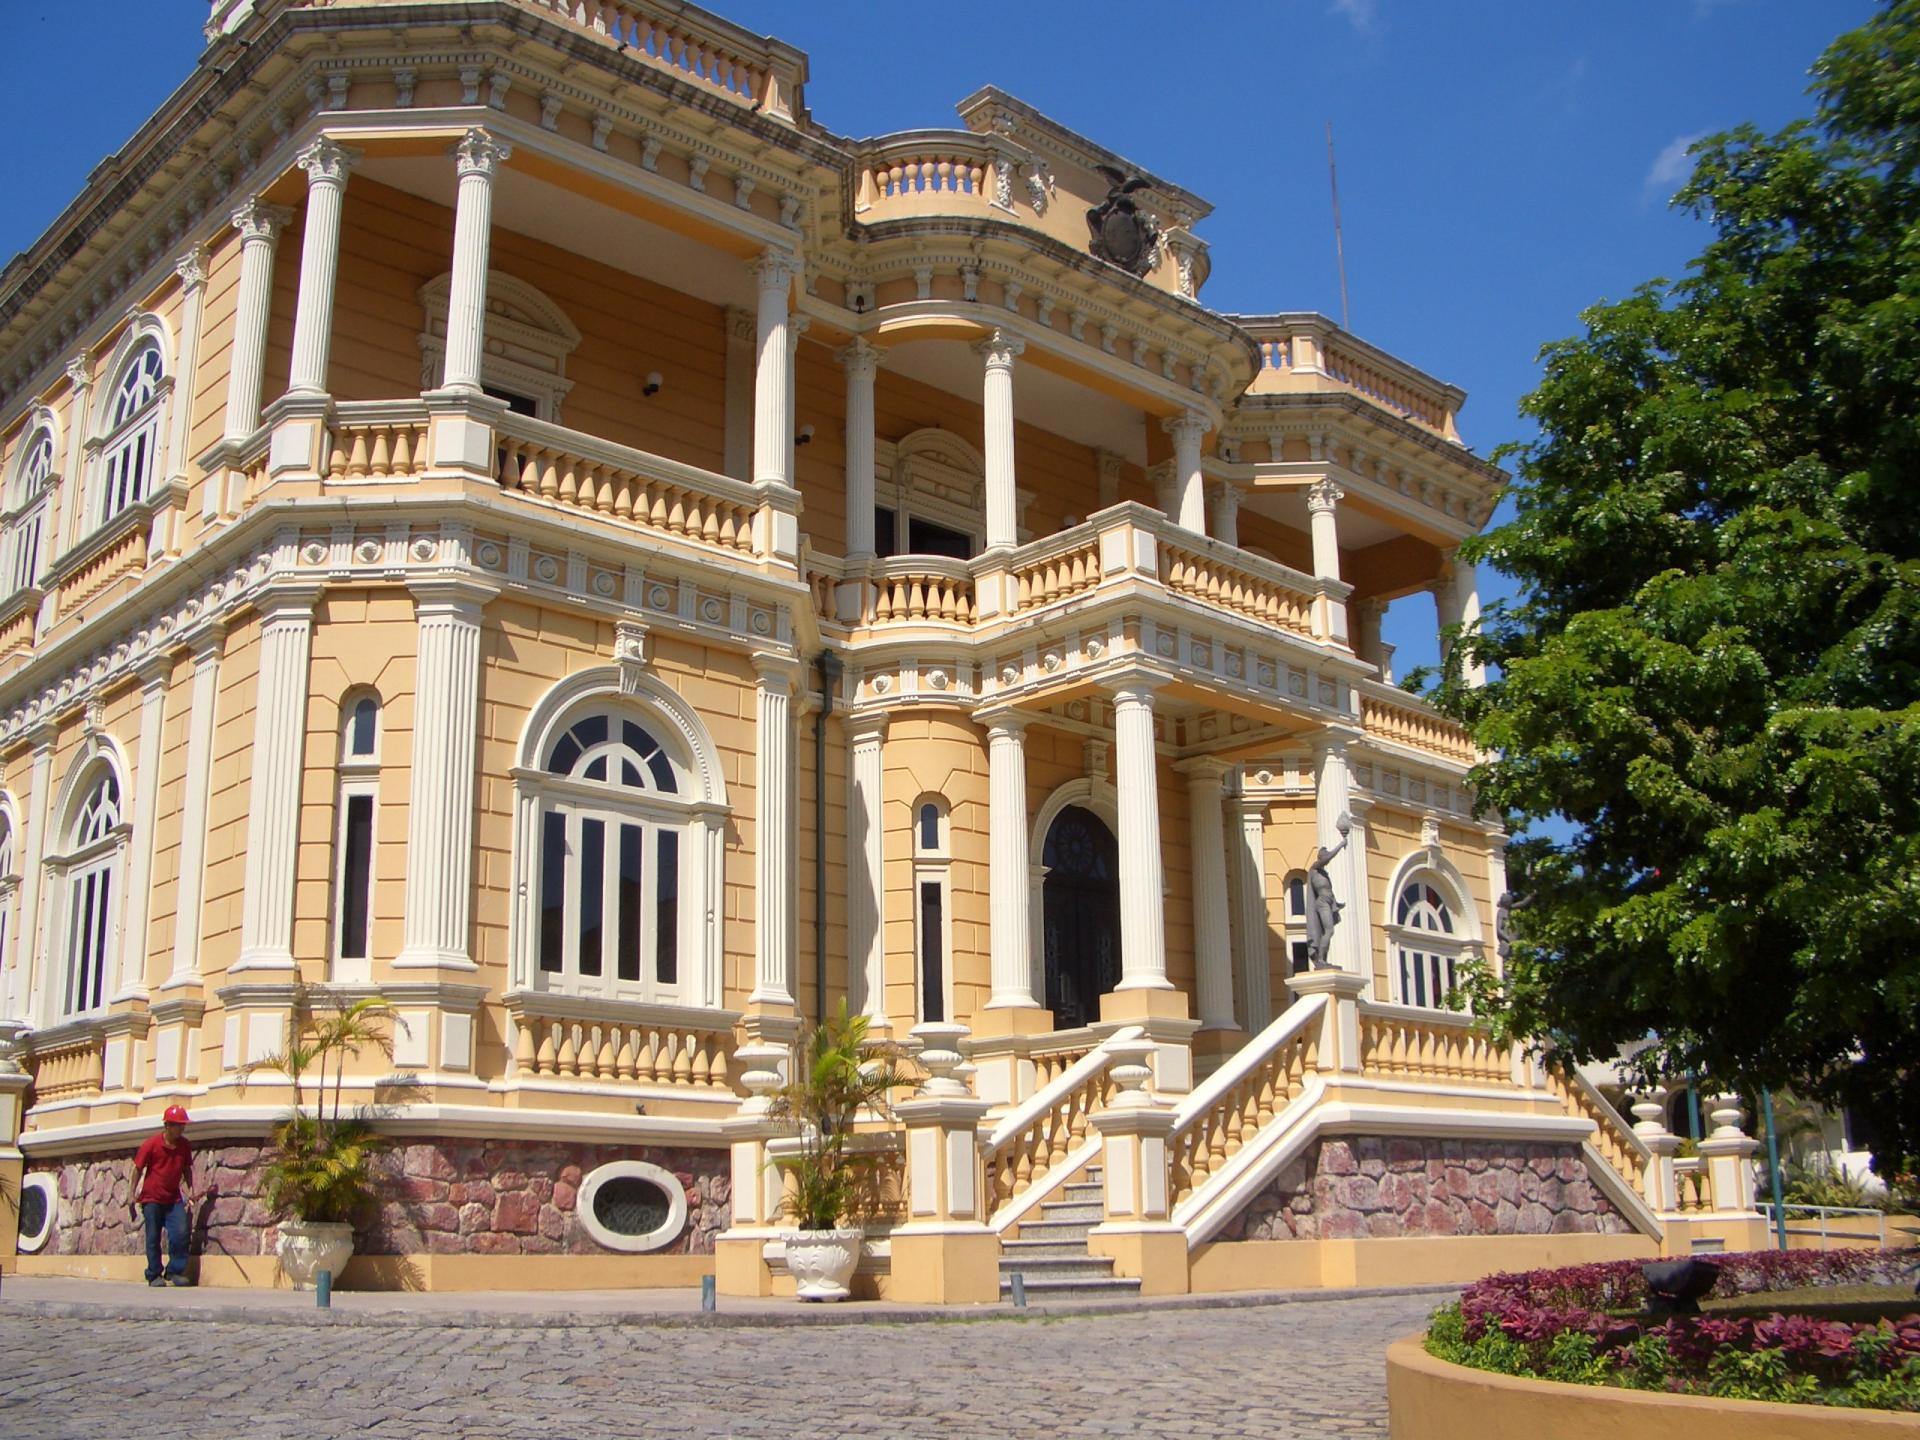 The Rio Negro Palace in Manaus